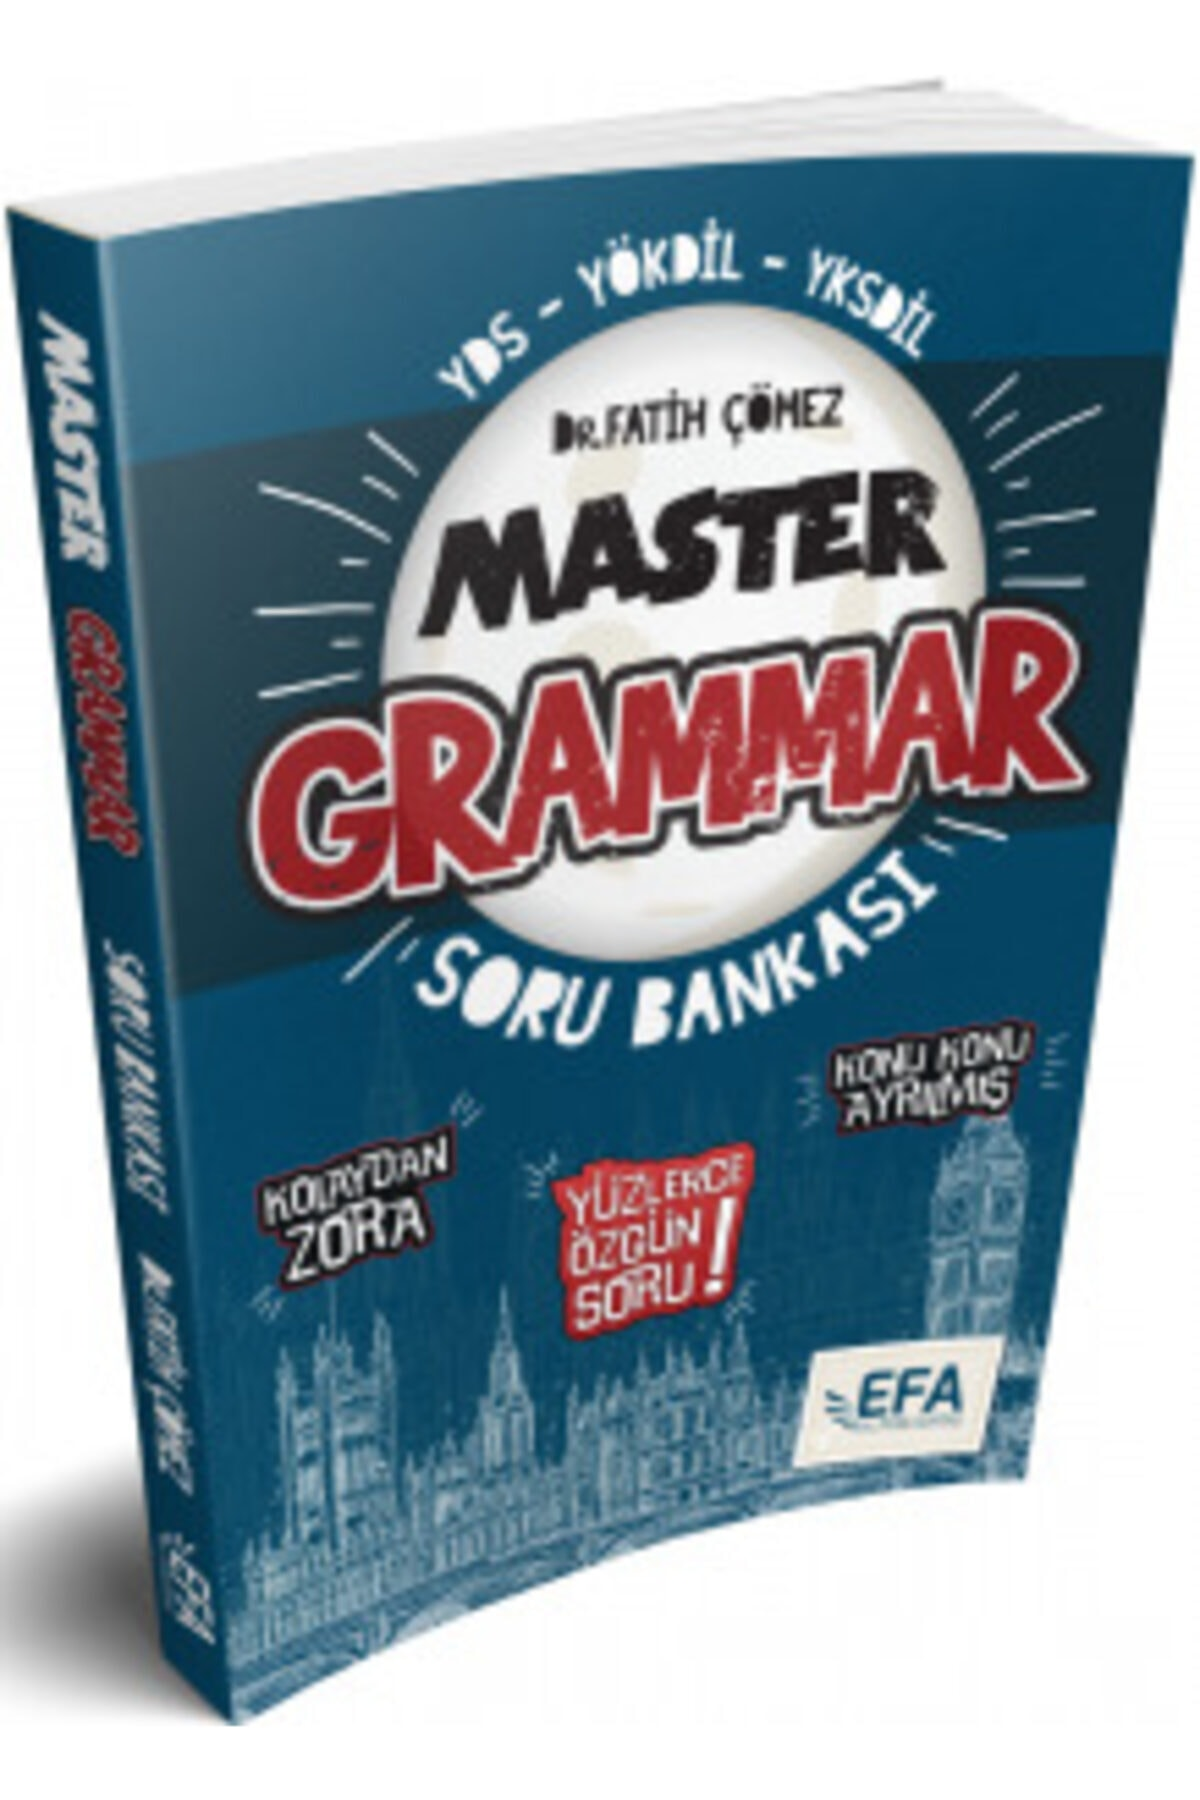 YDS YÖKDİL YKSDİL Master Grammar Soru Bankası 504